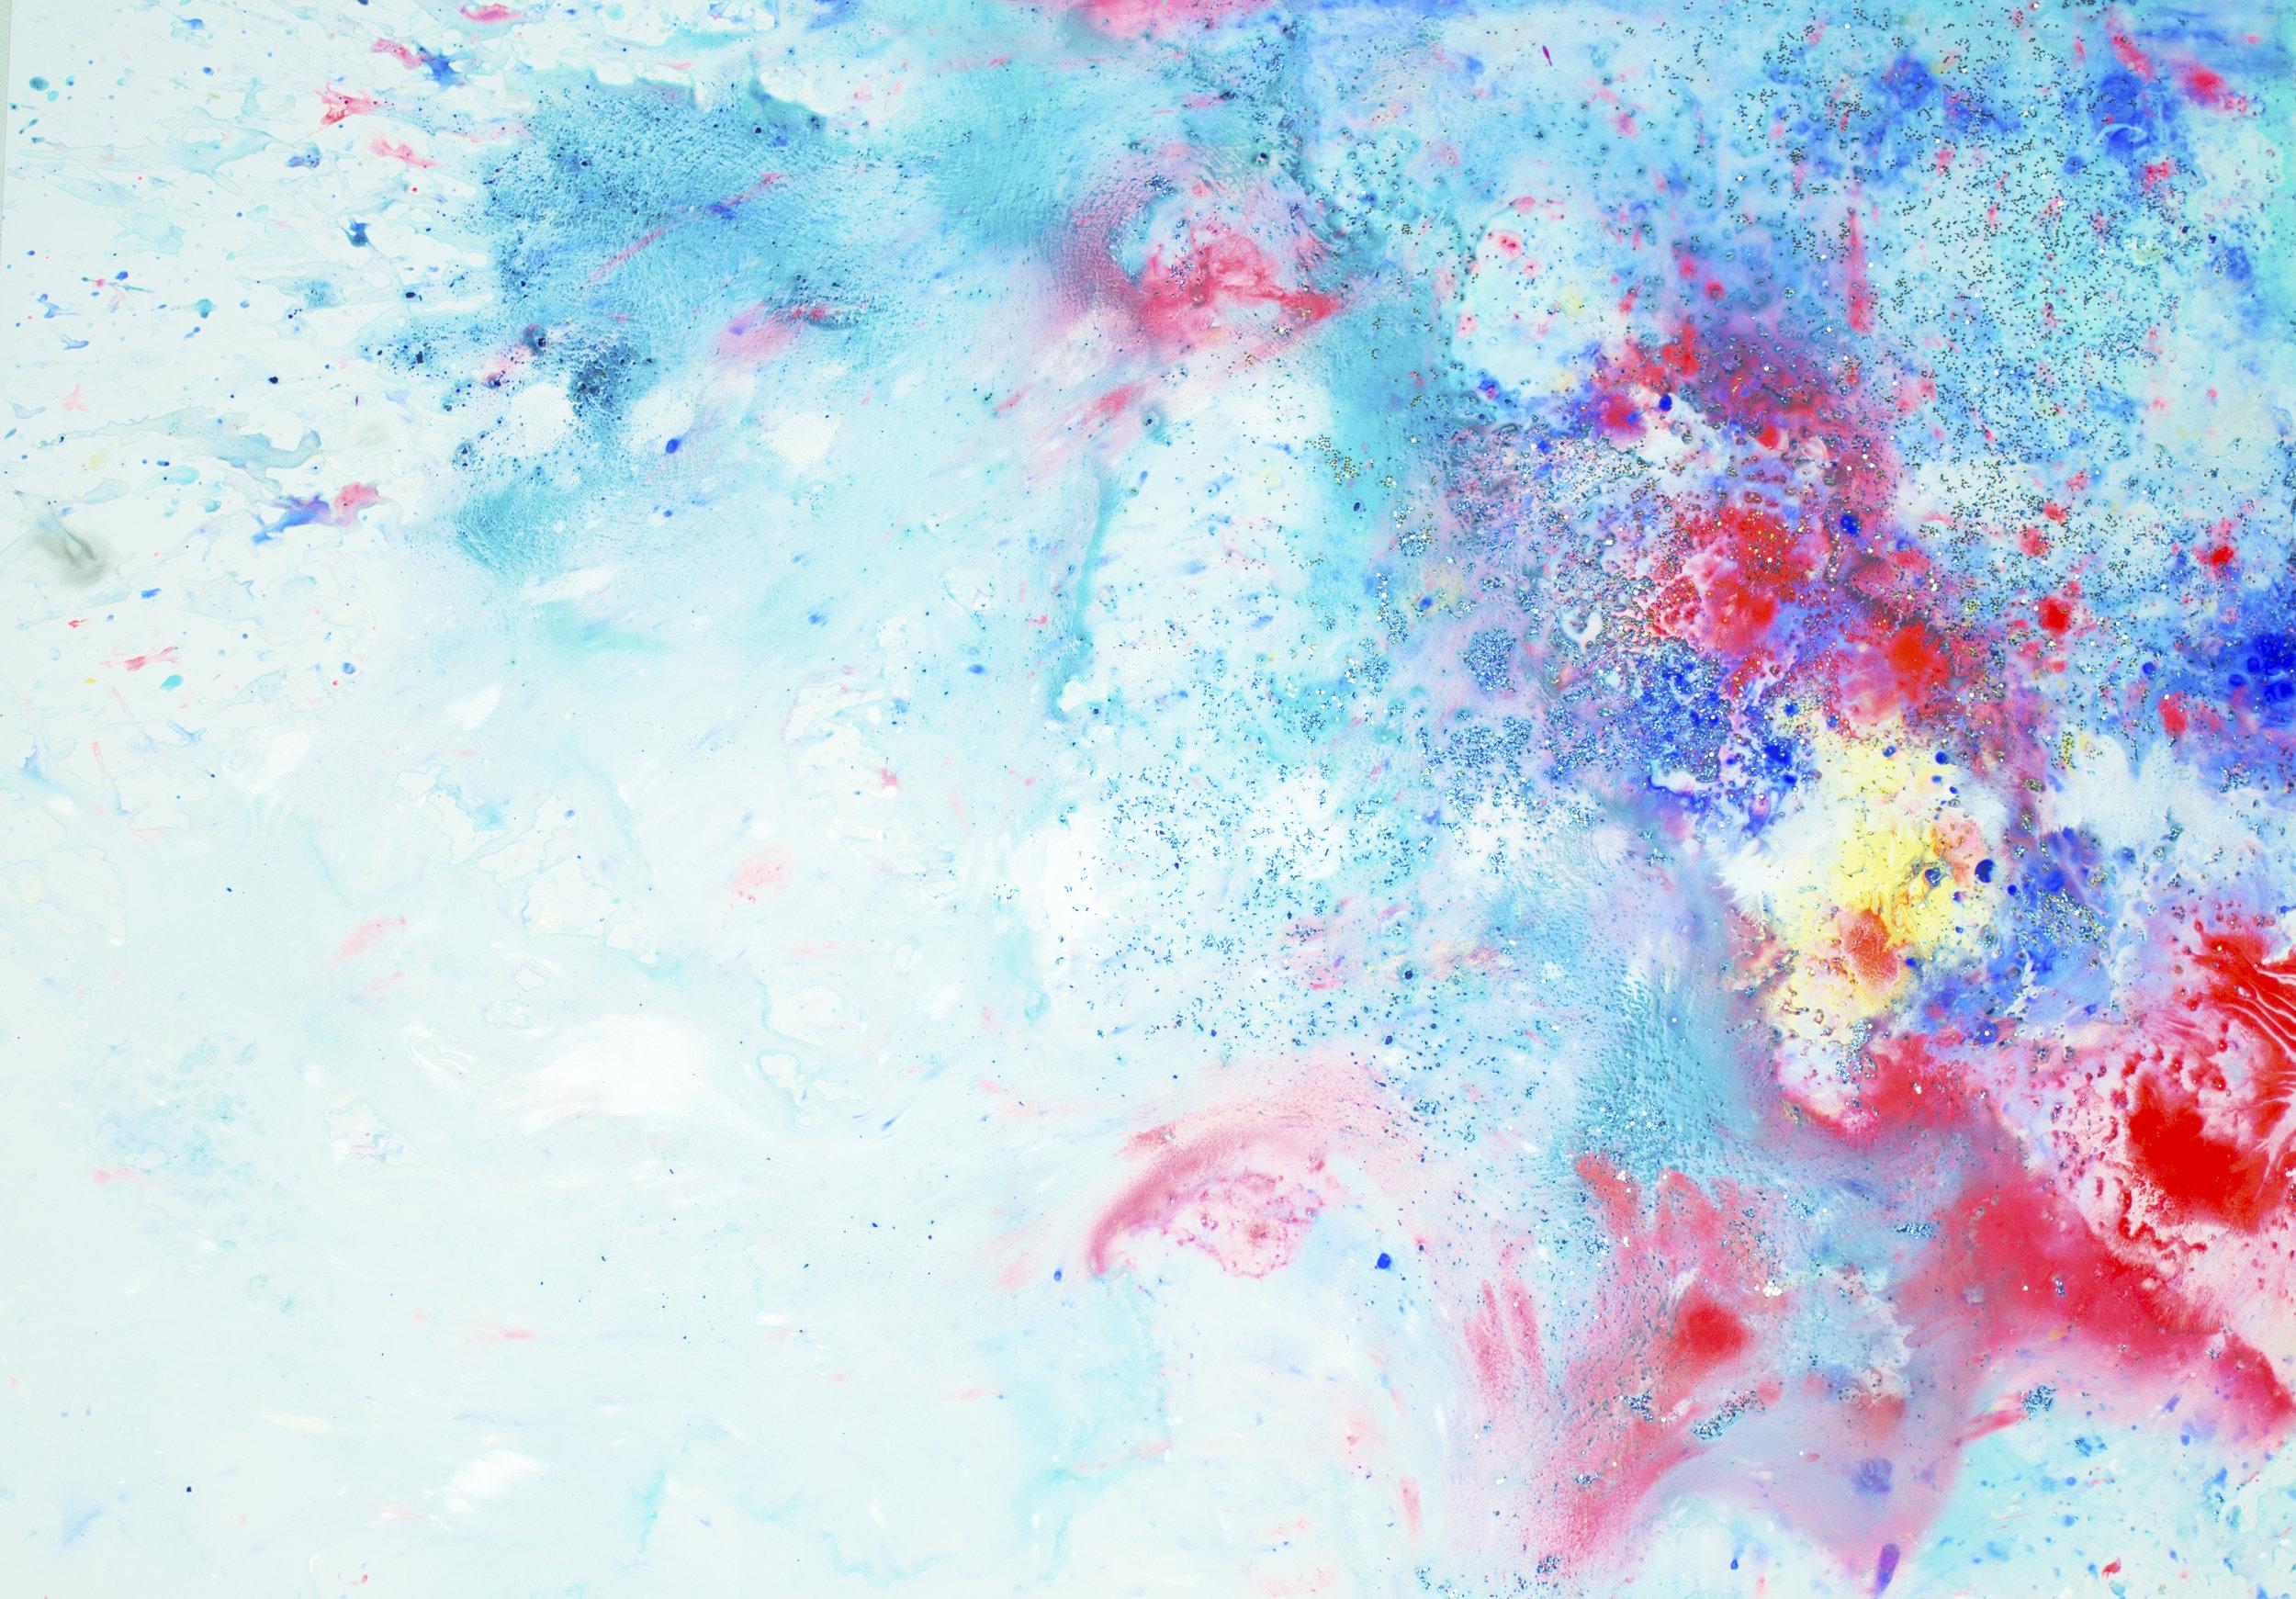 'Blush skies, NO. 6', 42 x 59,5 cm, acrylic paint on Steinpaperbase, Kerstin Pressler, www.kerstinpressler.com